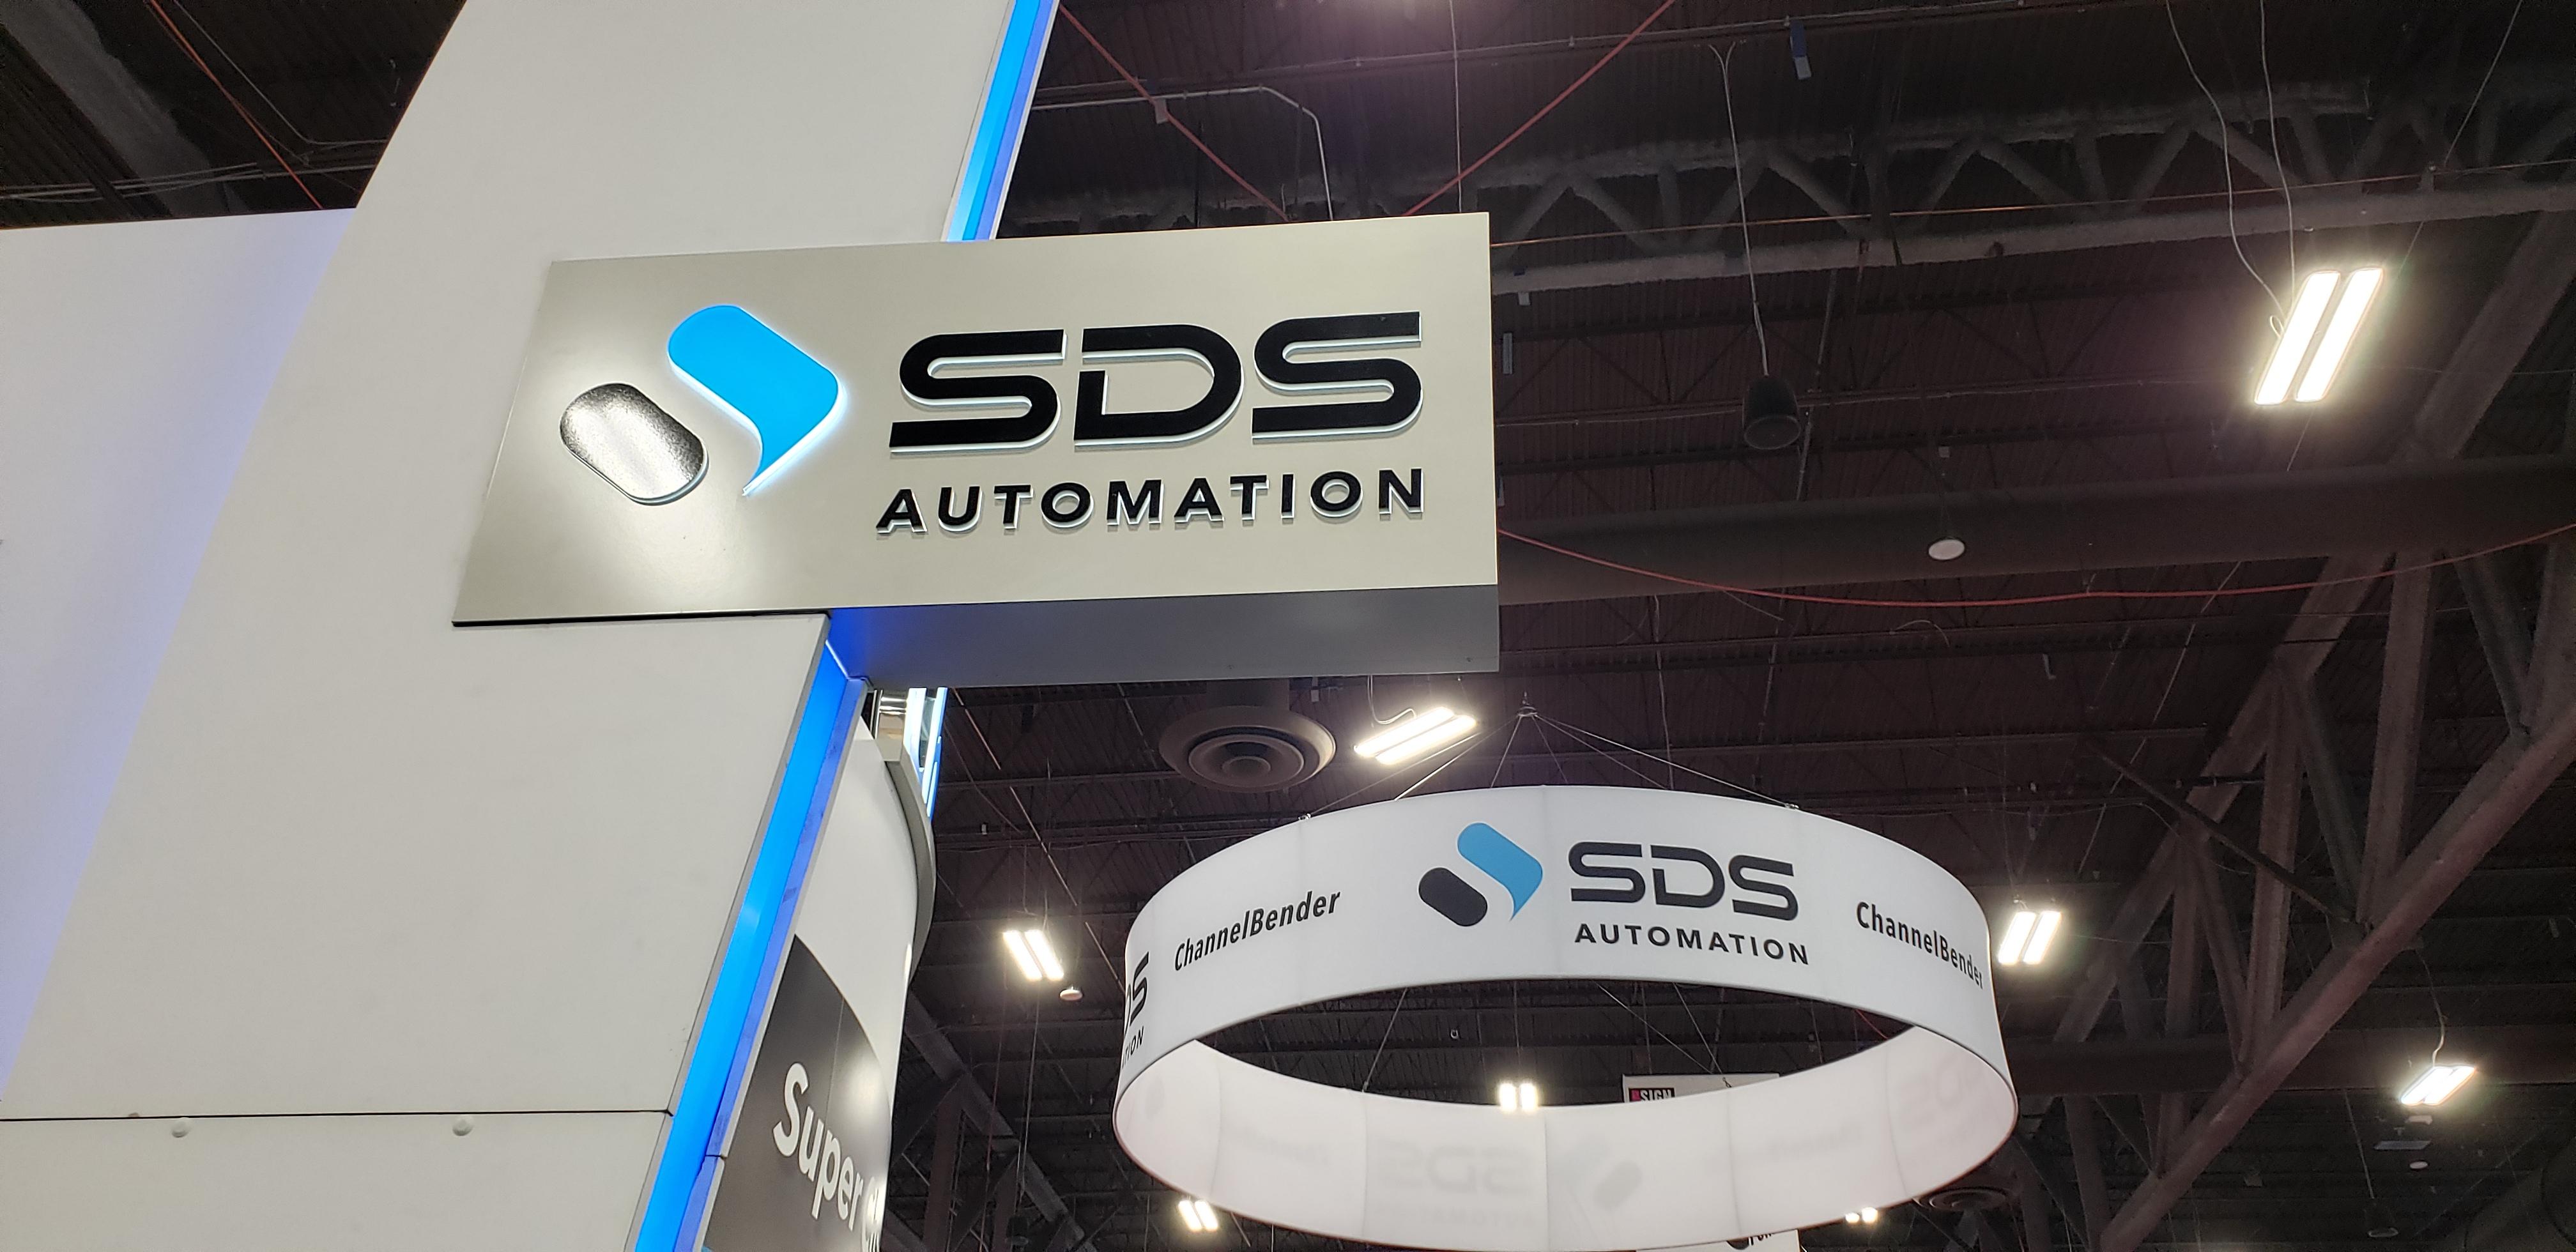 SDS AUTOMATION